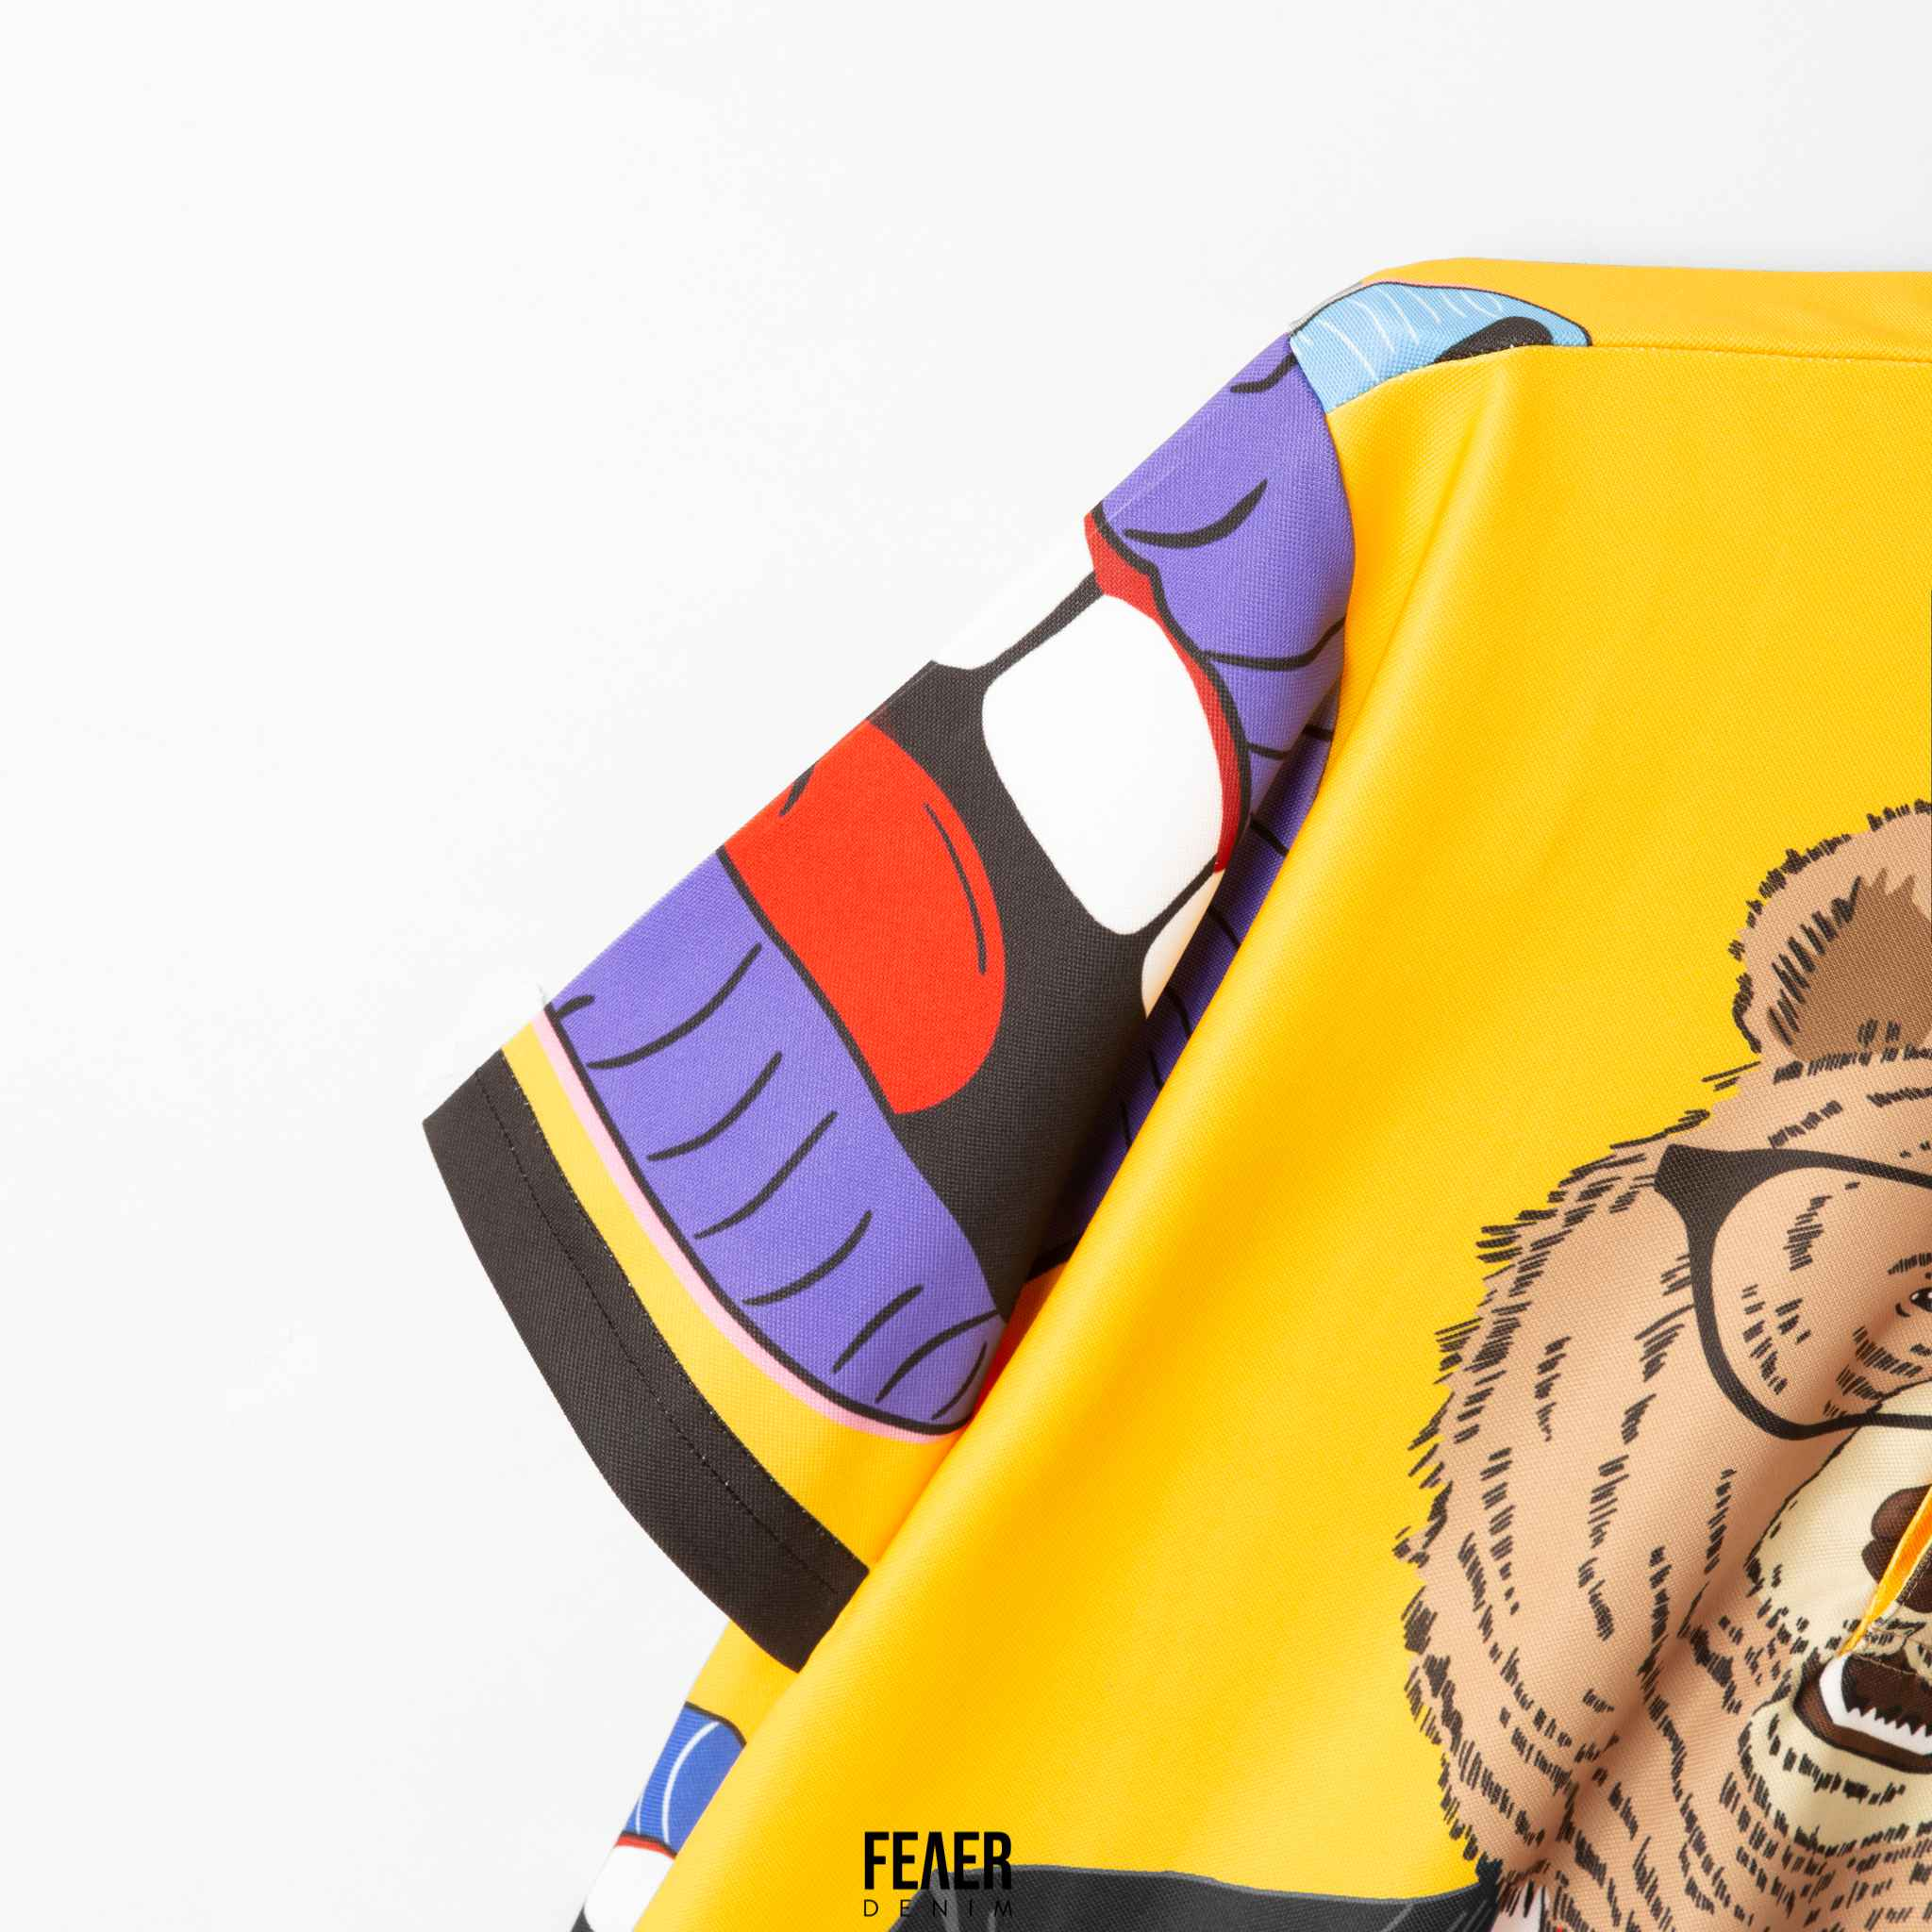 Áo thun nam Polo cổ bẻ họa tiết gấu GYPSY Bear chất Poly thoáng mát, co dản - FEAER DENIM